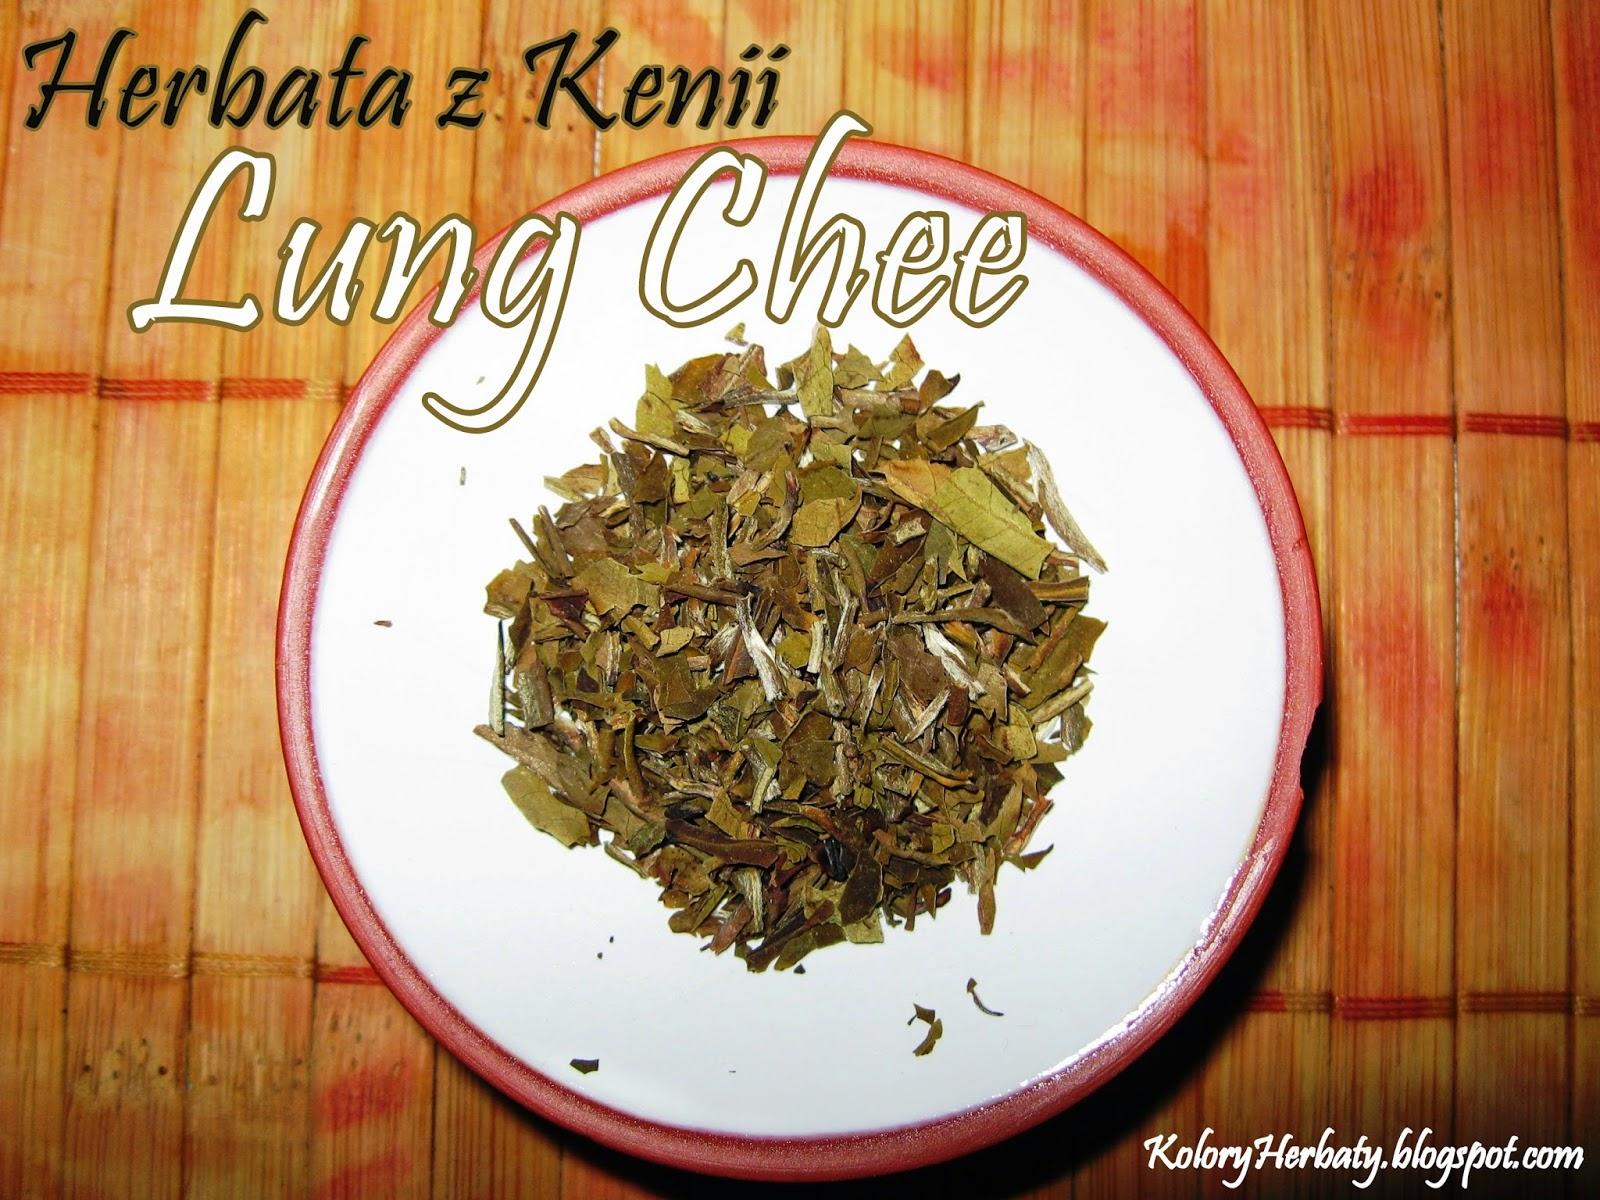 biała herbata Kenia Lung Chee